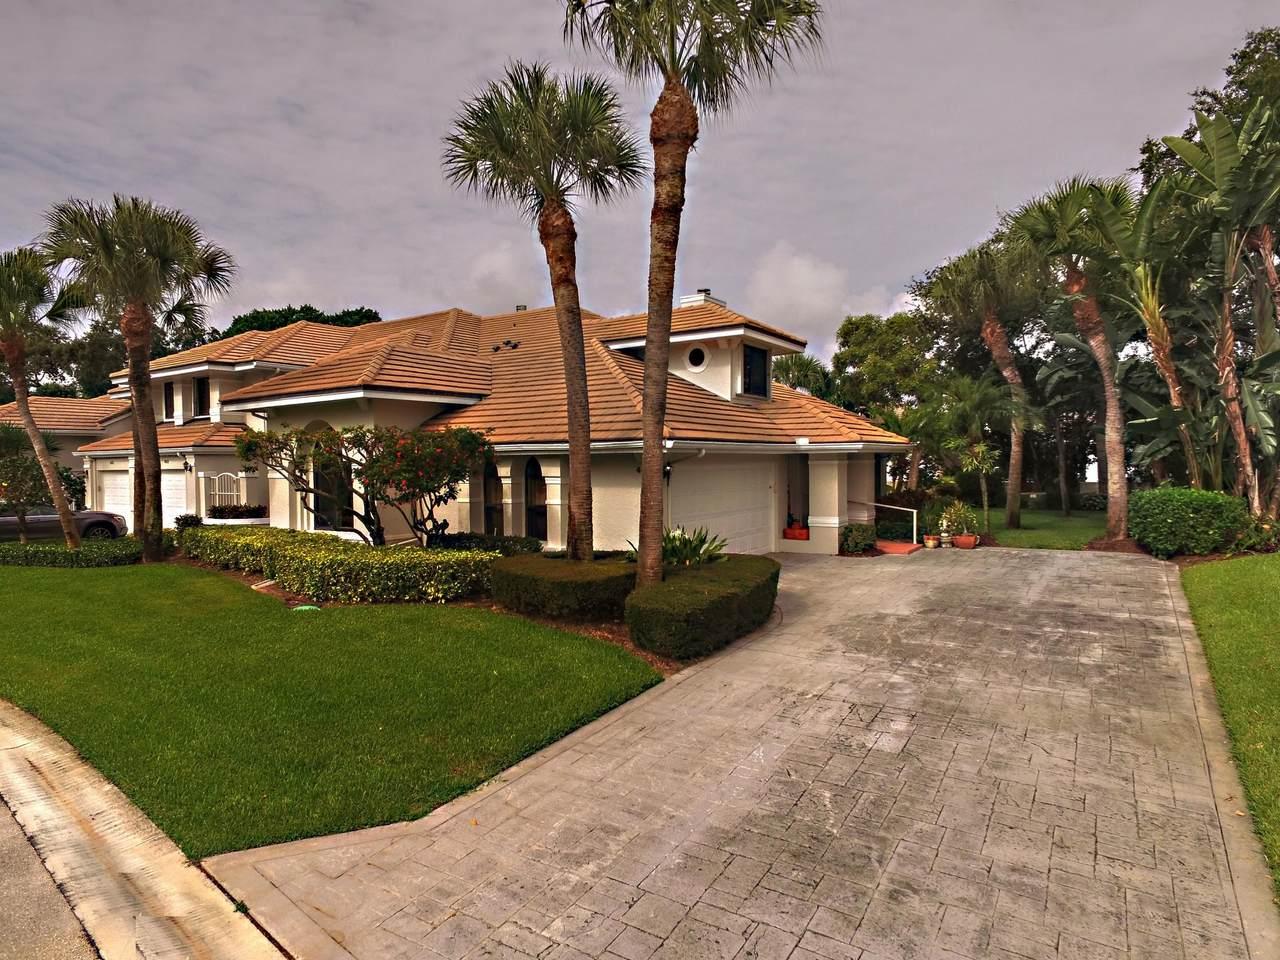 441 Coral Cove Drive - Photo 1